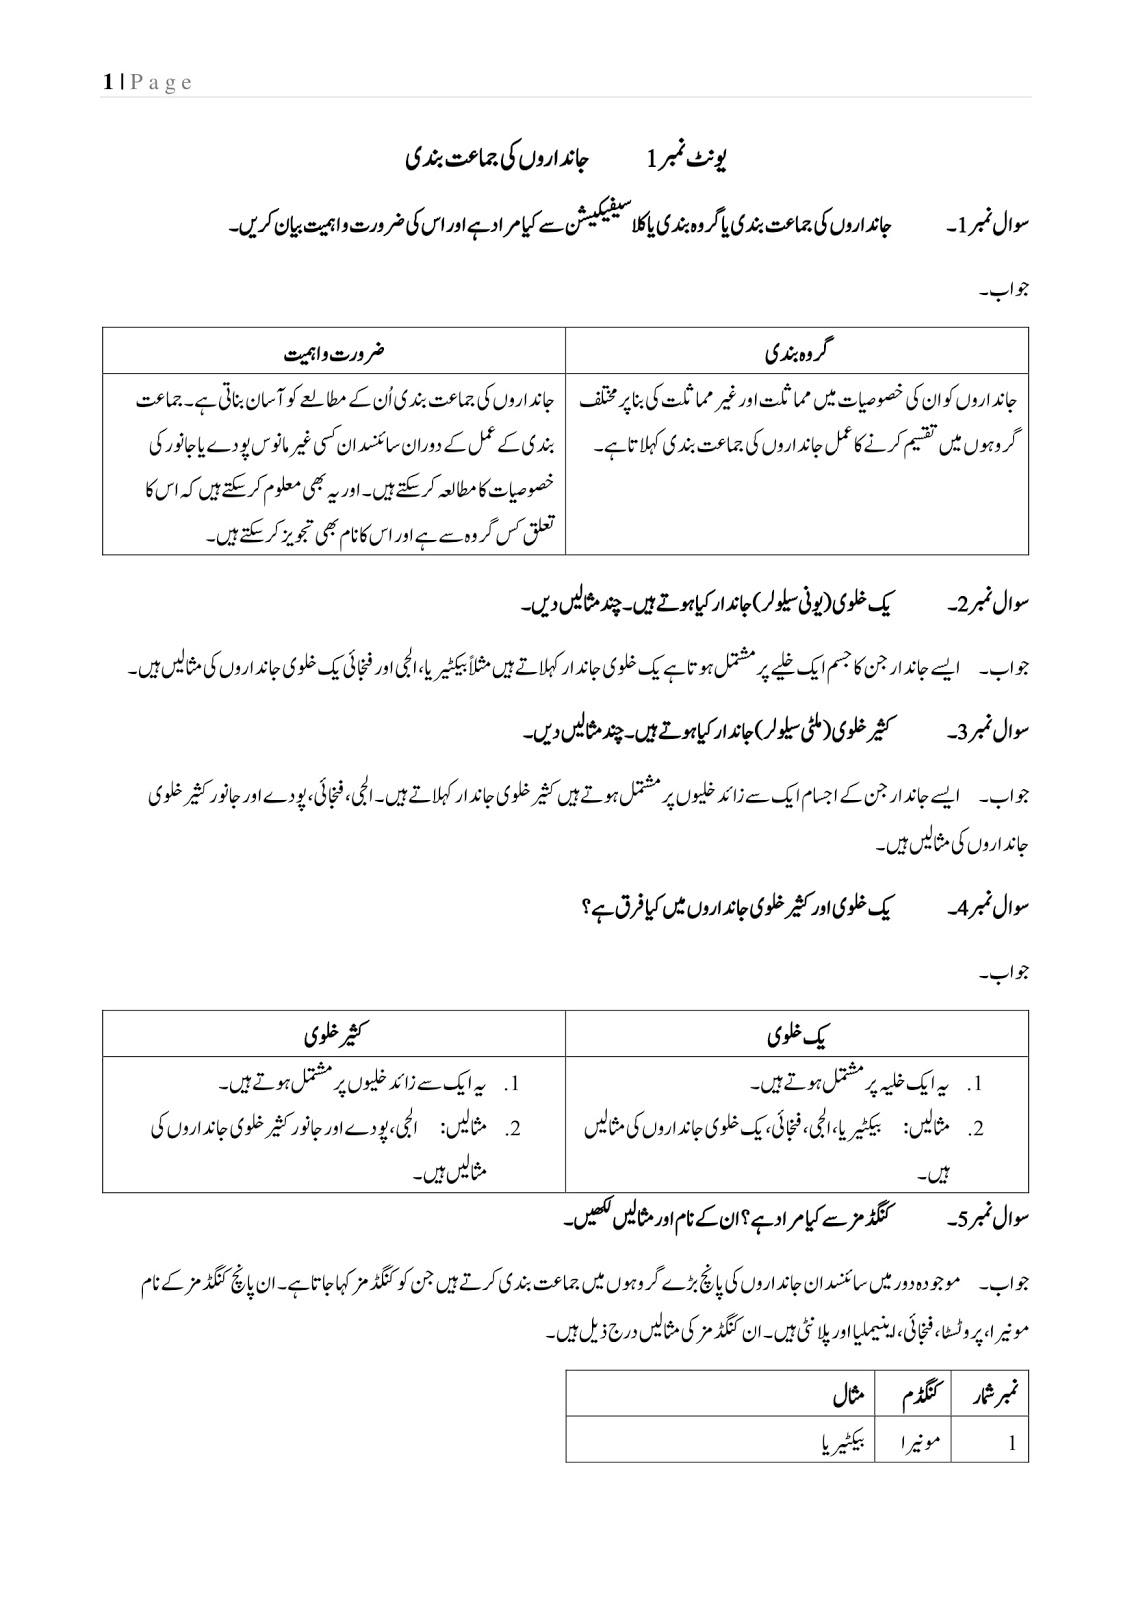 5th Class Science Full Book Easy Notes Urdu Medium